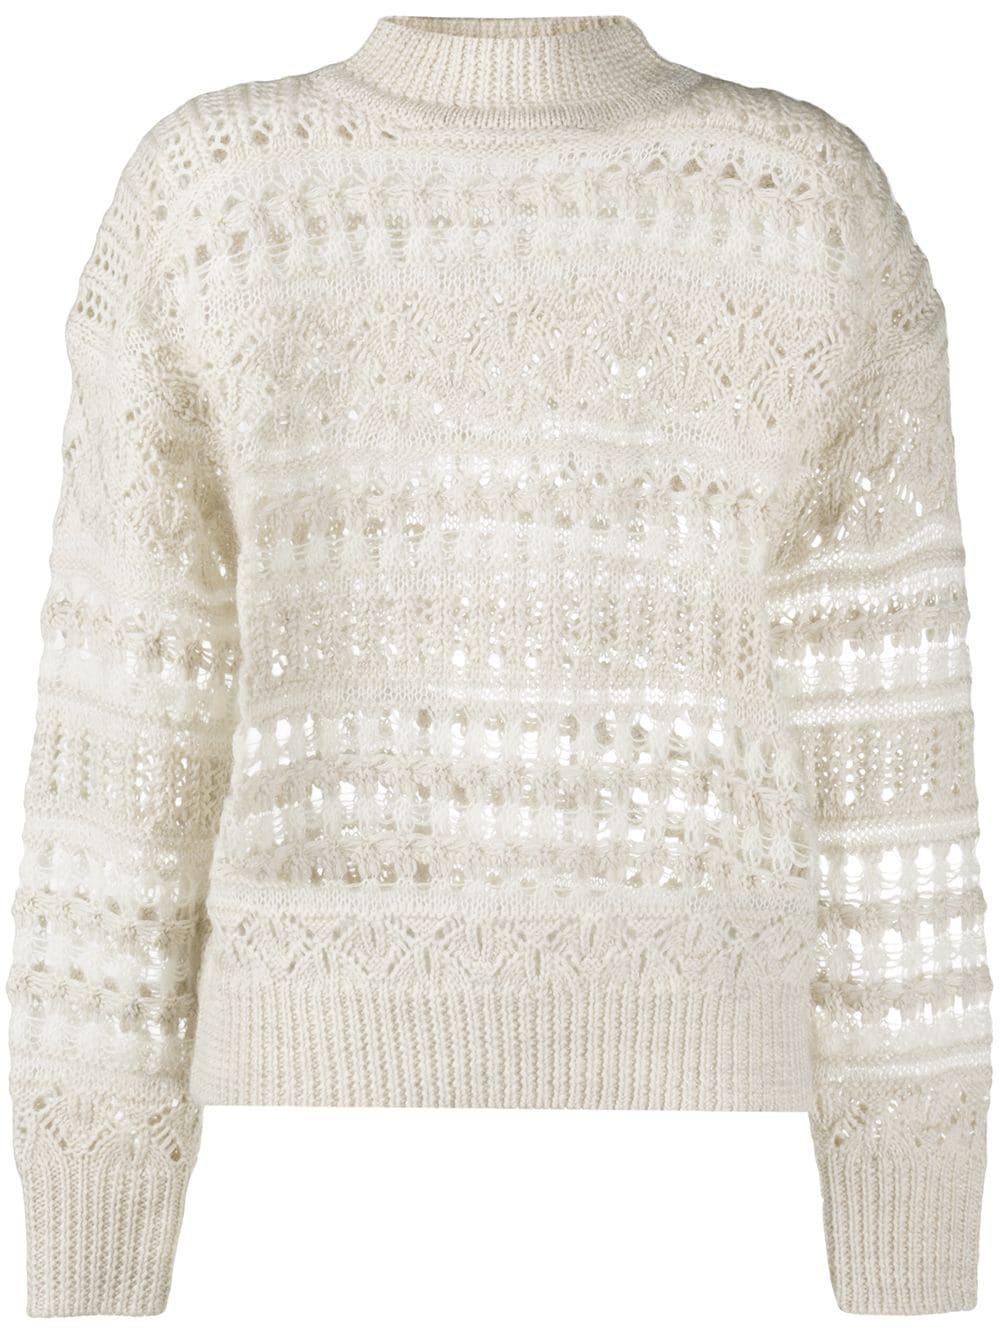 Pernille Wool Sweater